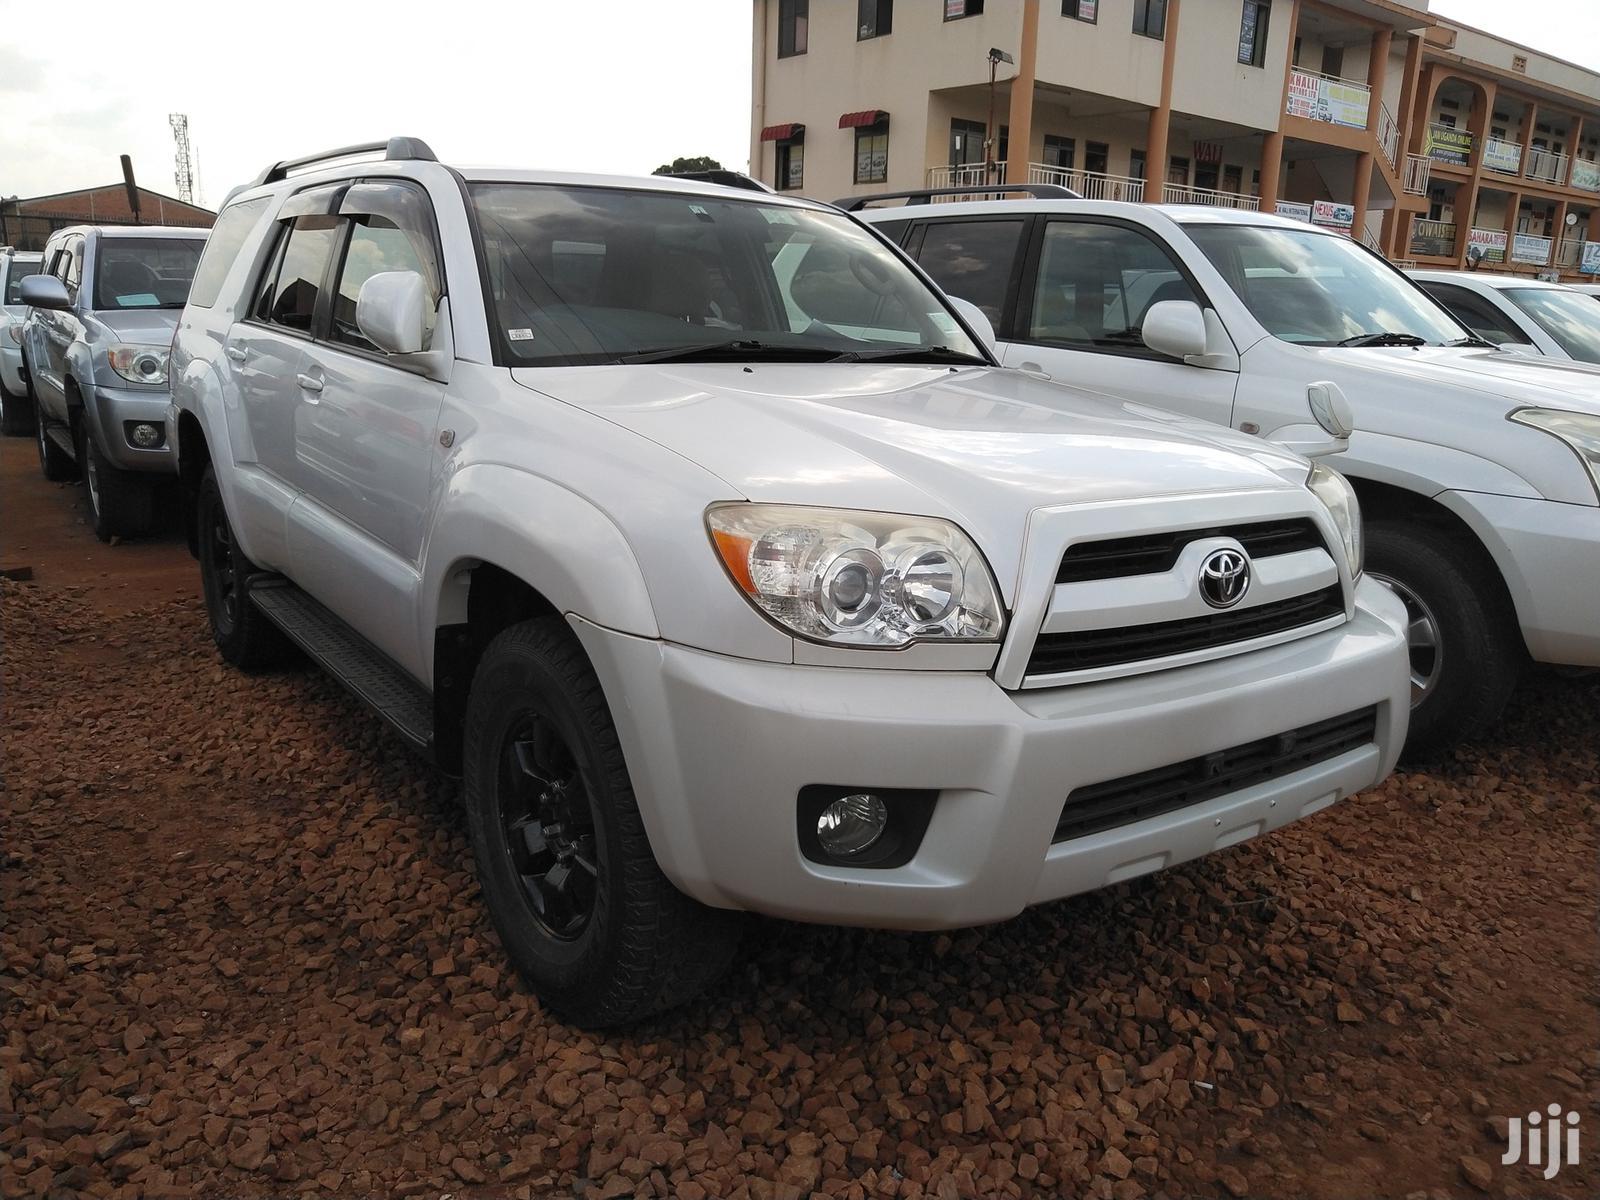 Toyota Surf 2006 White | Cars for sale in Kampala, Central Region, Uganda